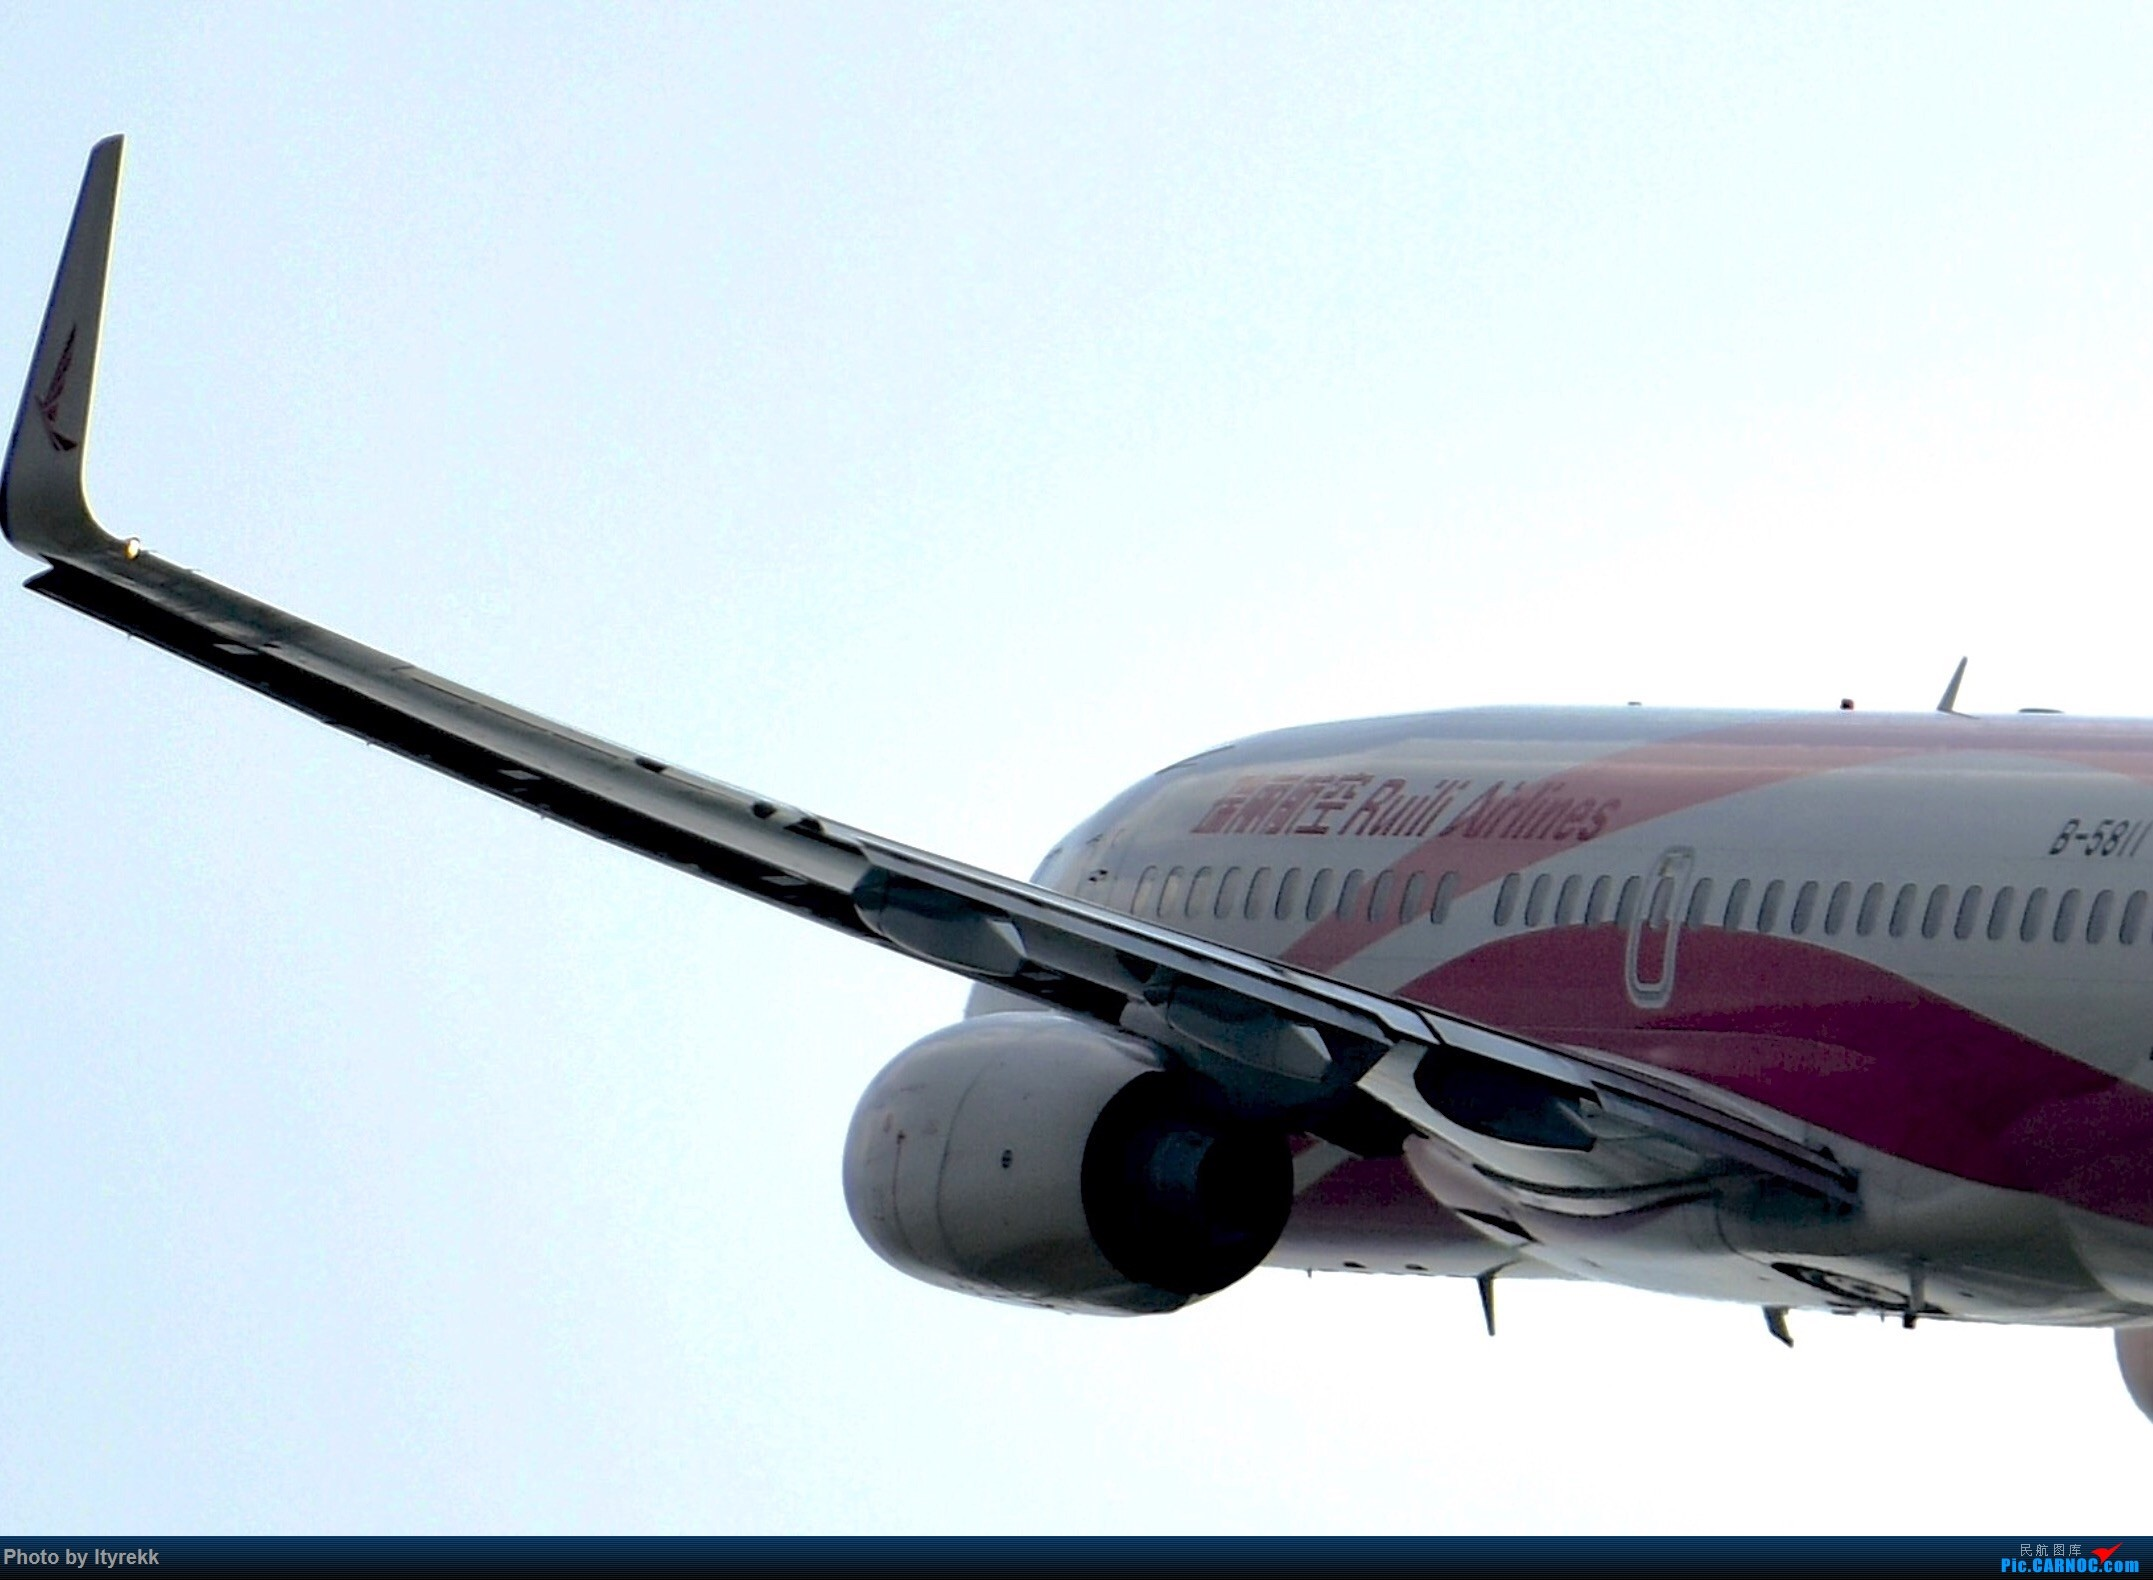 Re:[原创]【5.23LUM】玩腻了楼顶拍,来一次现场版的!求小飞机 BOEING 737-700 B-5811 中国芒市机场